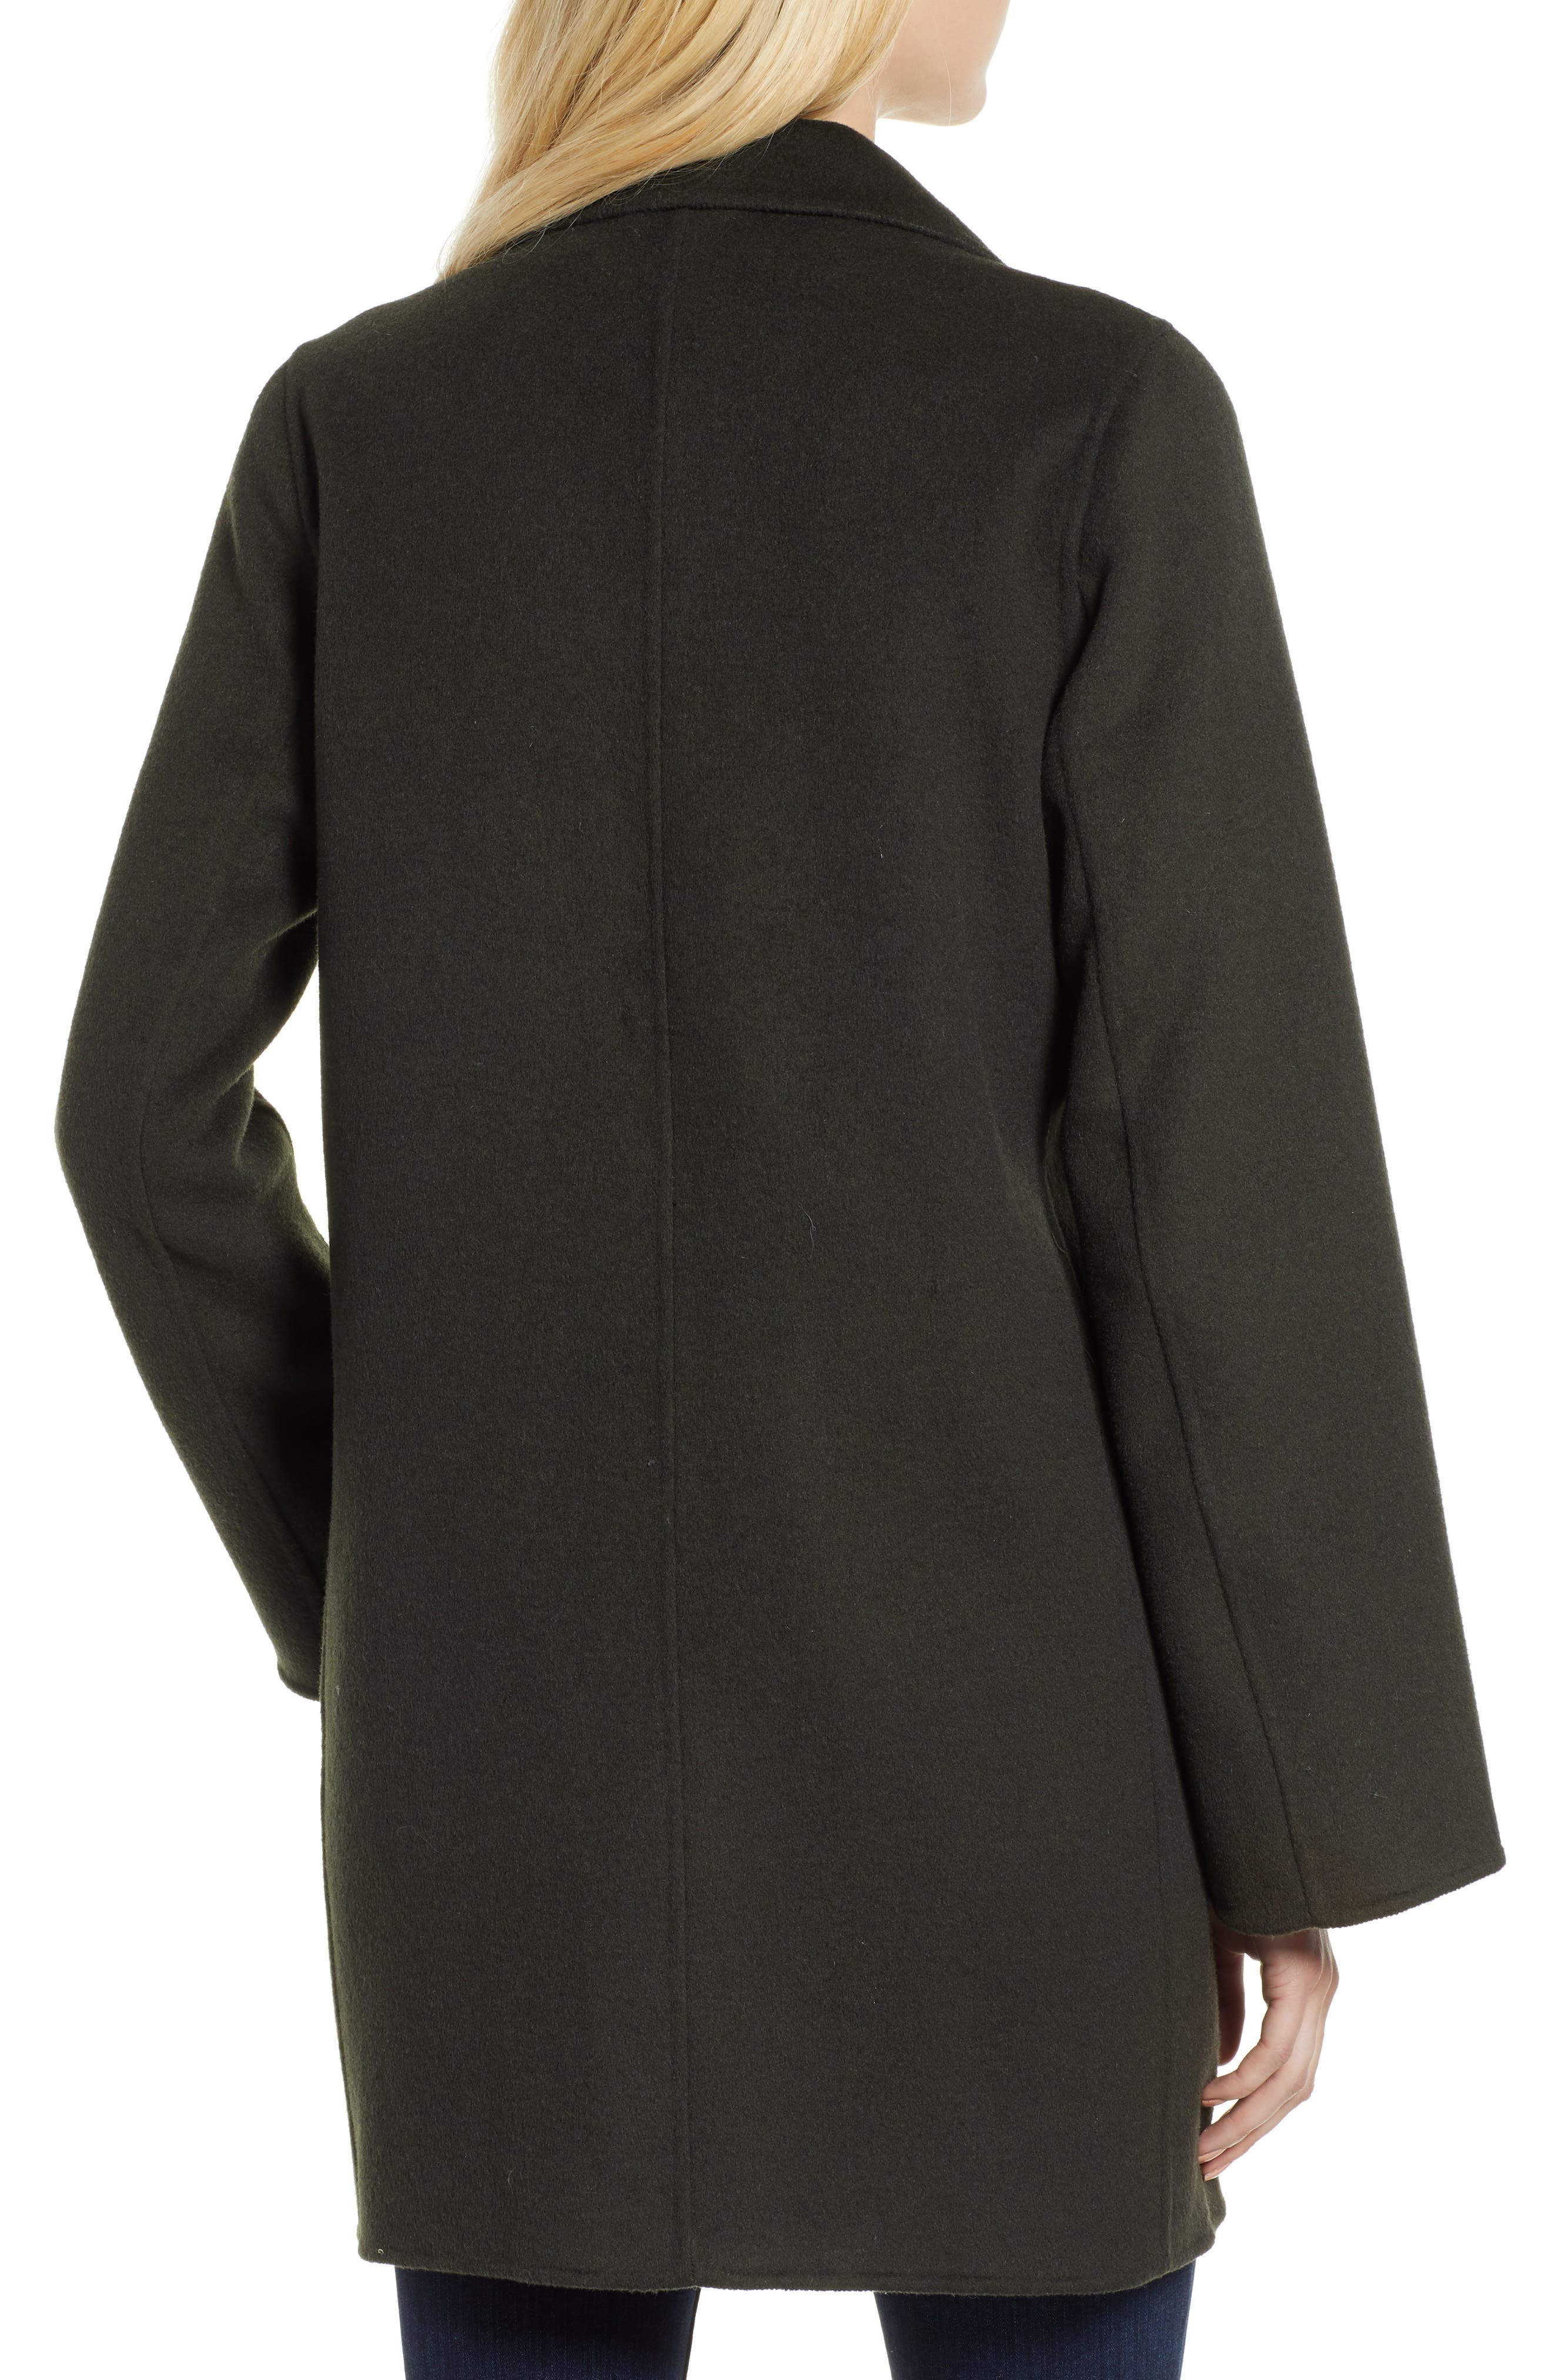 Jayden Bell Sleeve Jacket,                             Alternate thumbnail 2, color,                             CHIVE